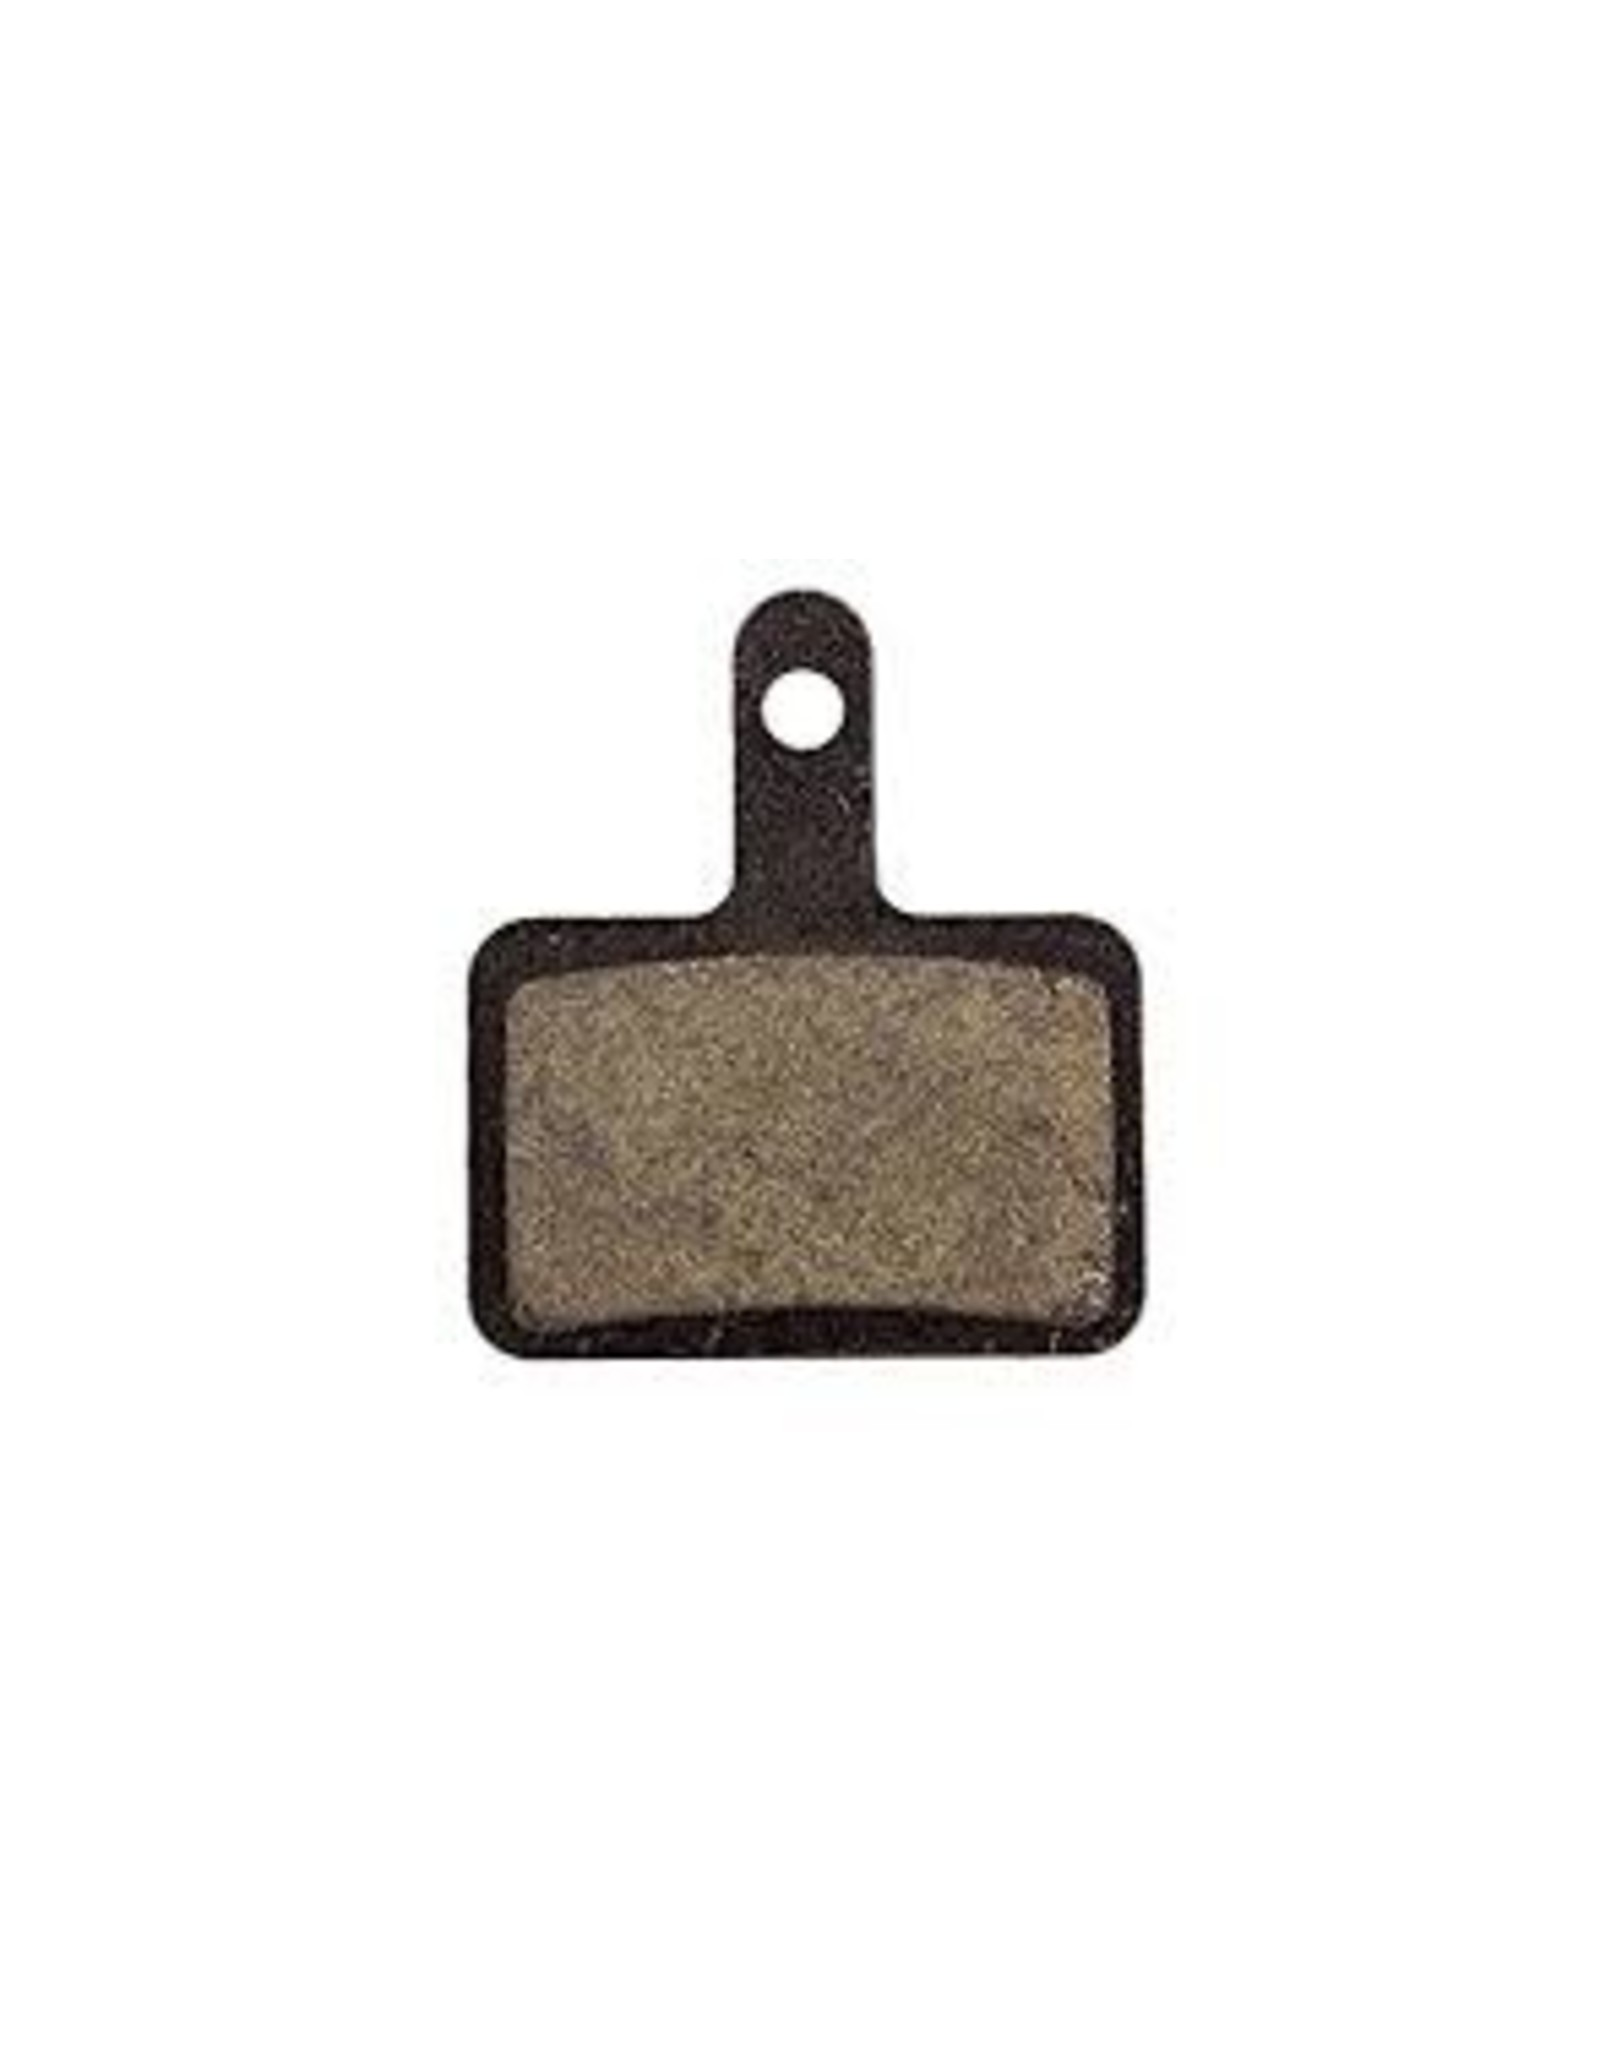 Brake Pad Orgin-8 Disc Semi-Met Avid XO/Sram Guide